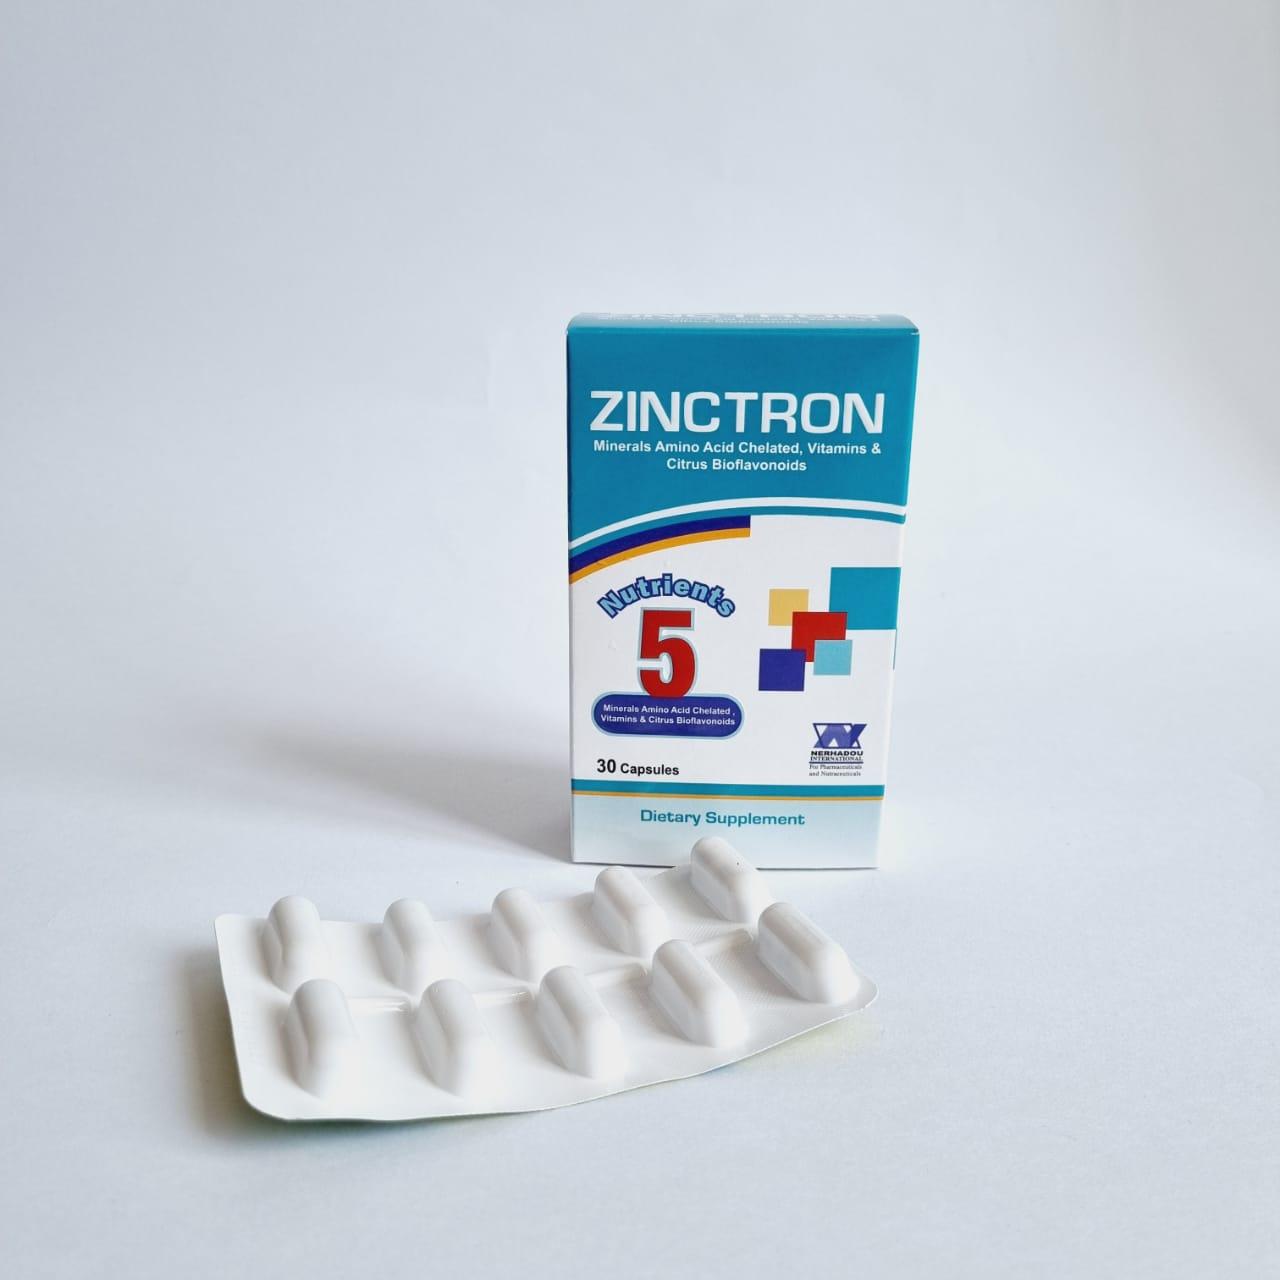 ZINCTRON